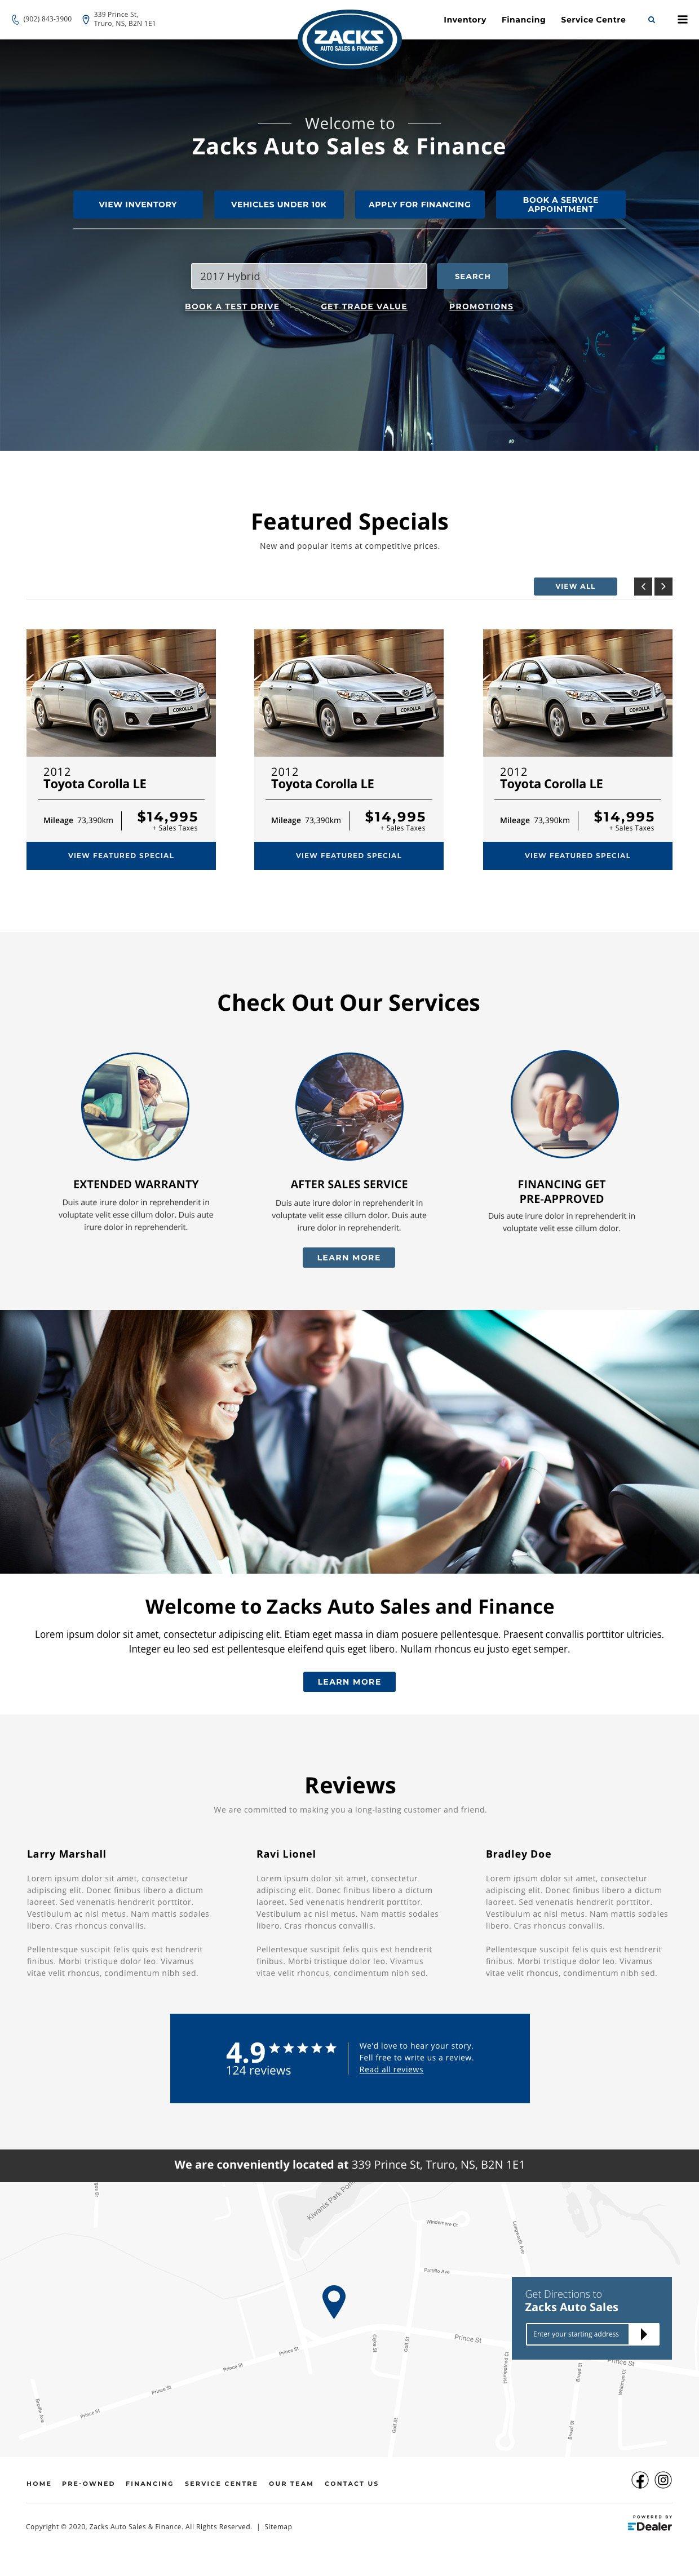 Zacks Auto Sales